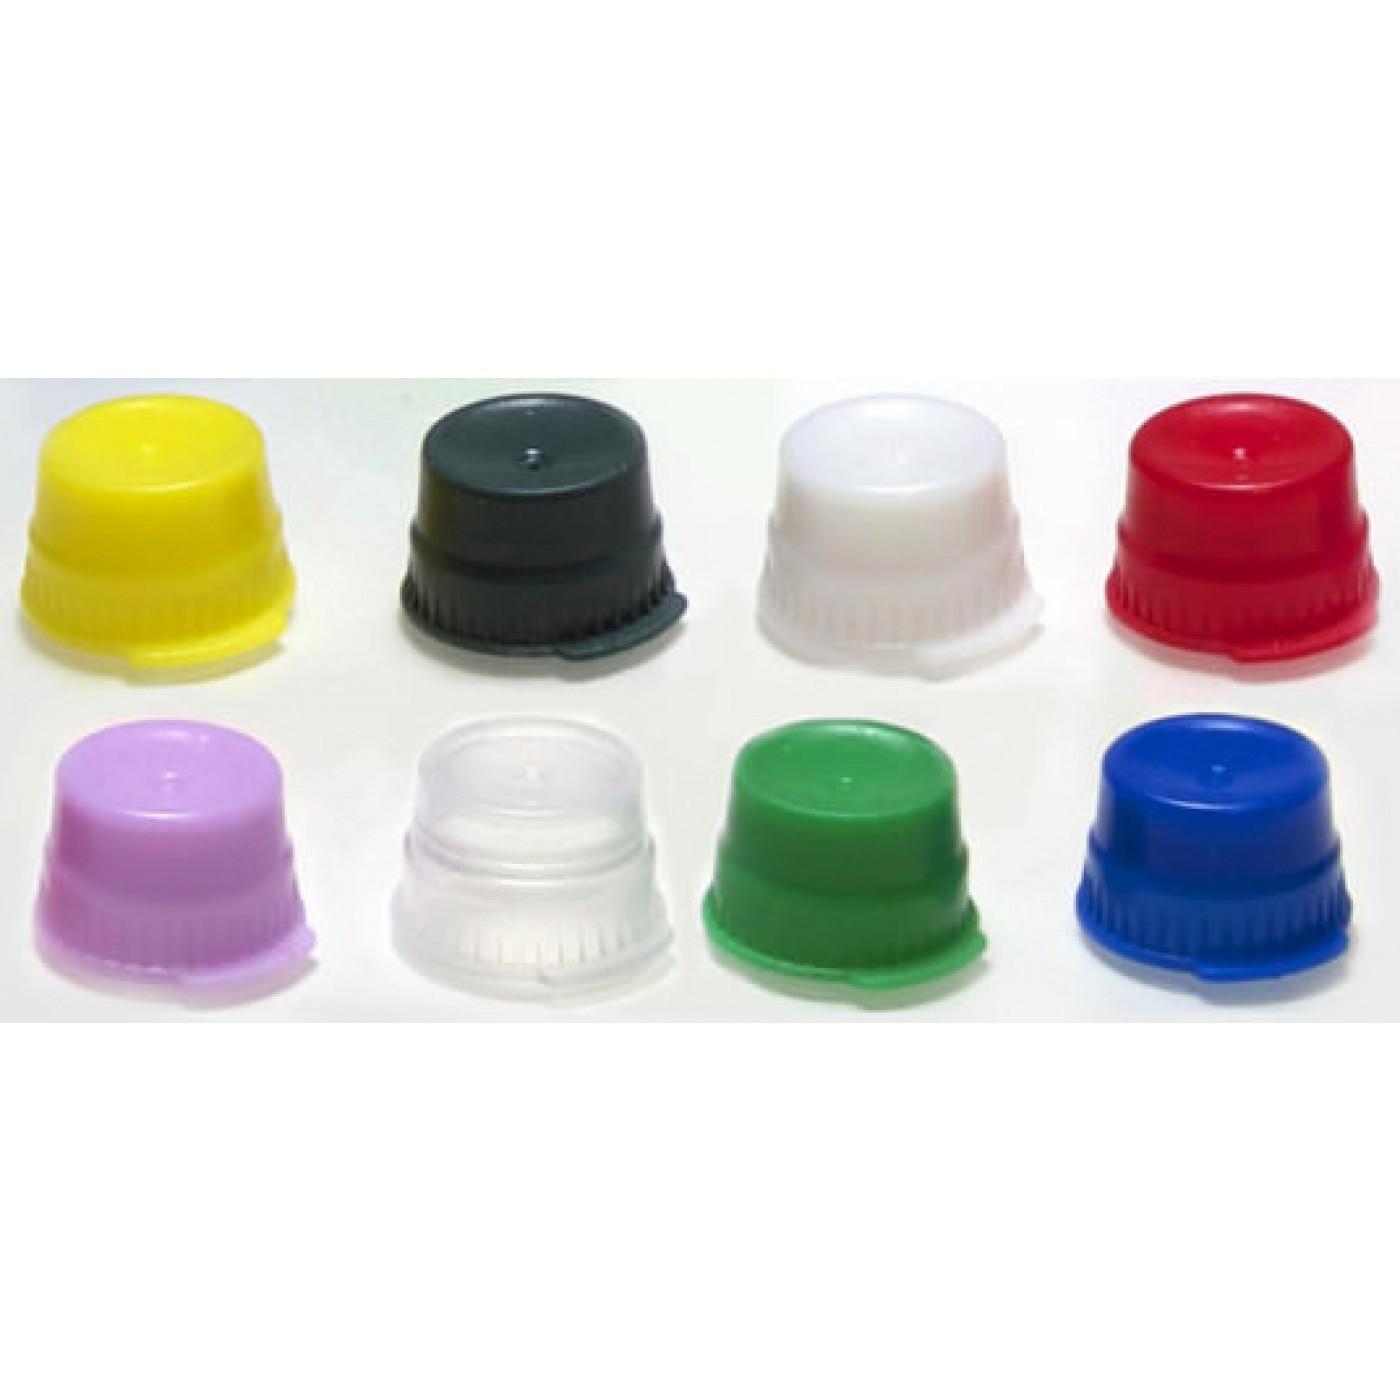 Test Tube Caps